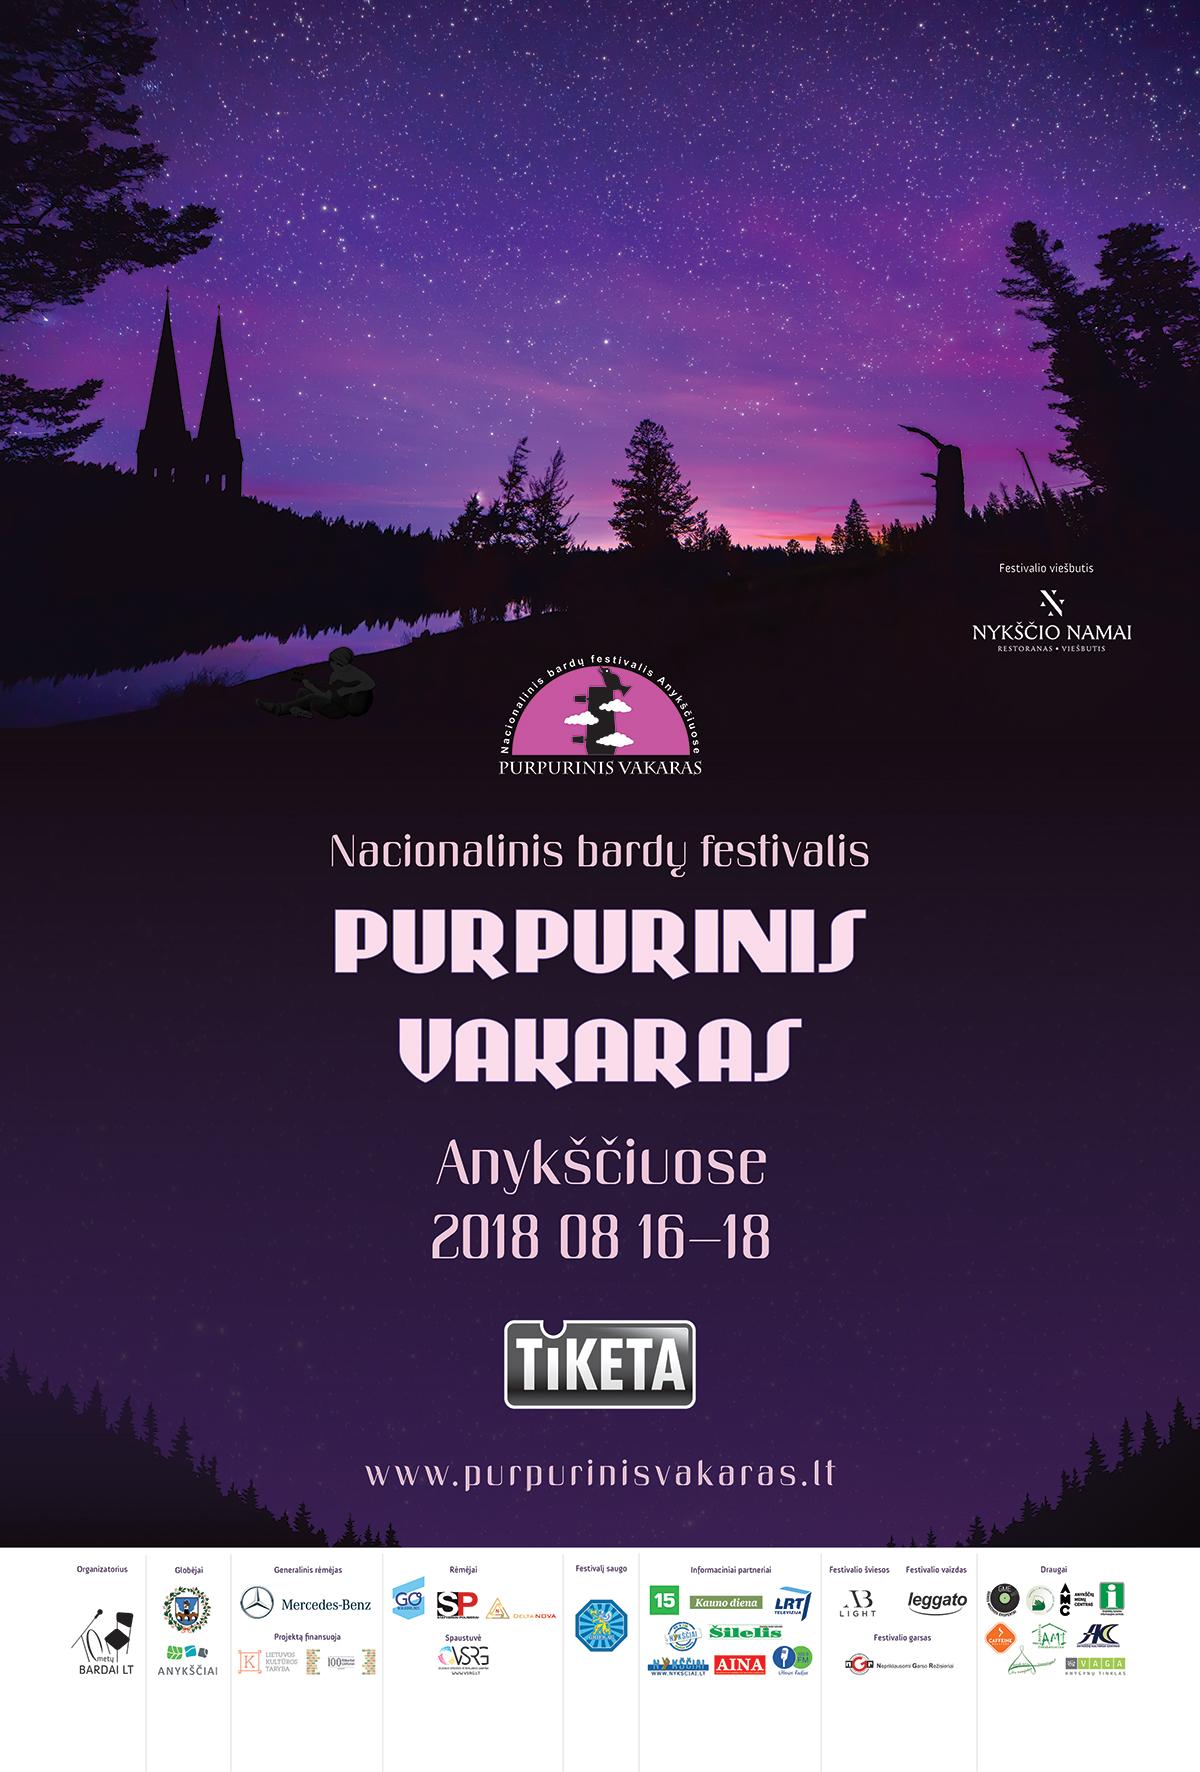 Purpurinis-vakaras-2018_JCDecaux_vitrina_1185x1750mm_preview